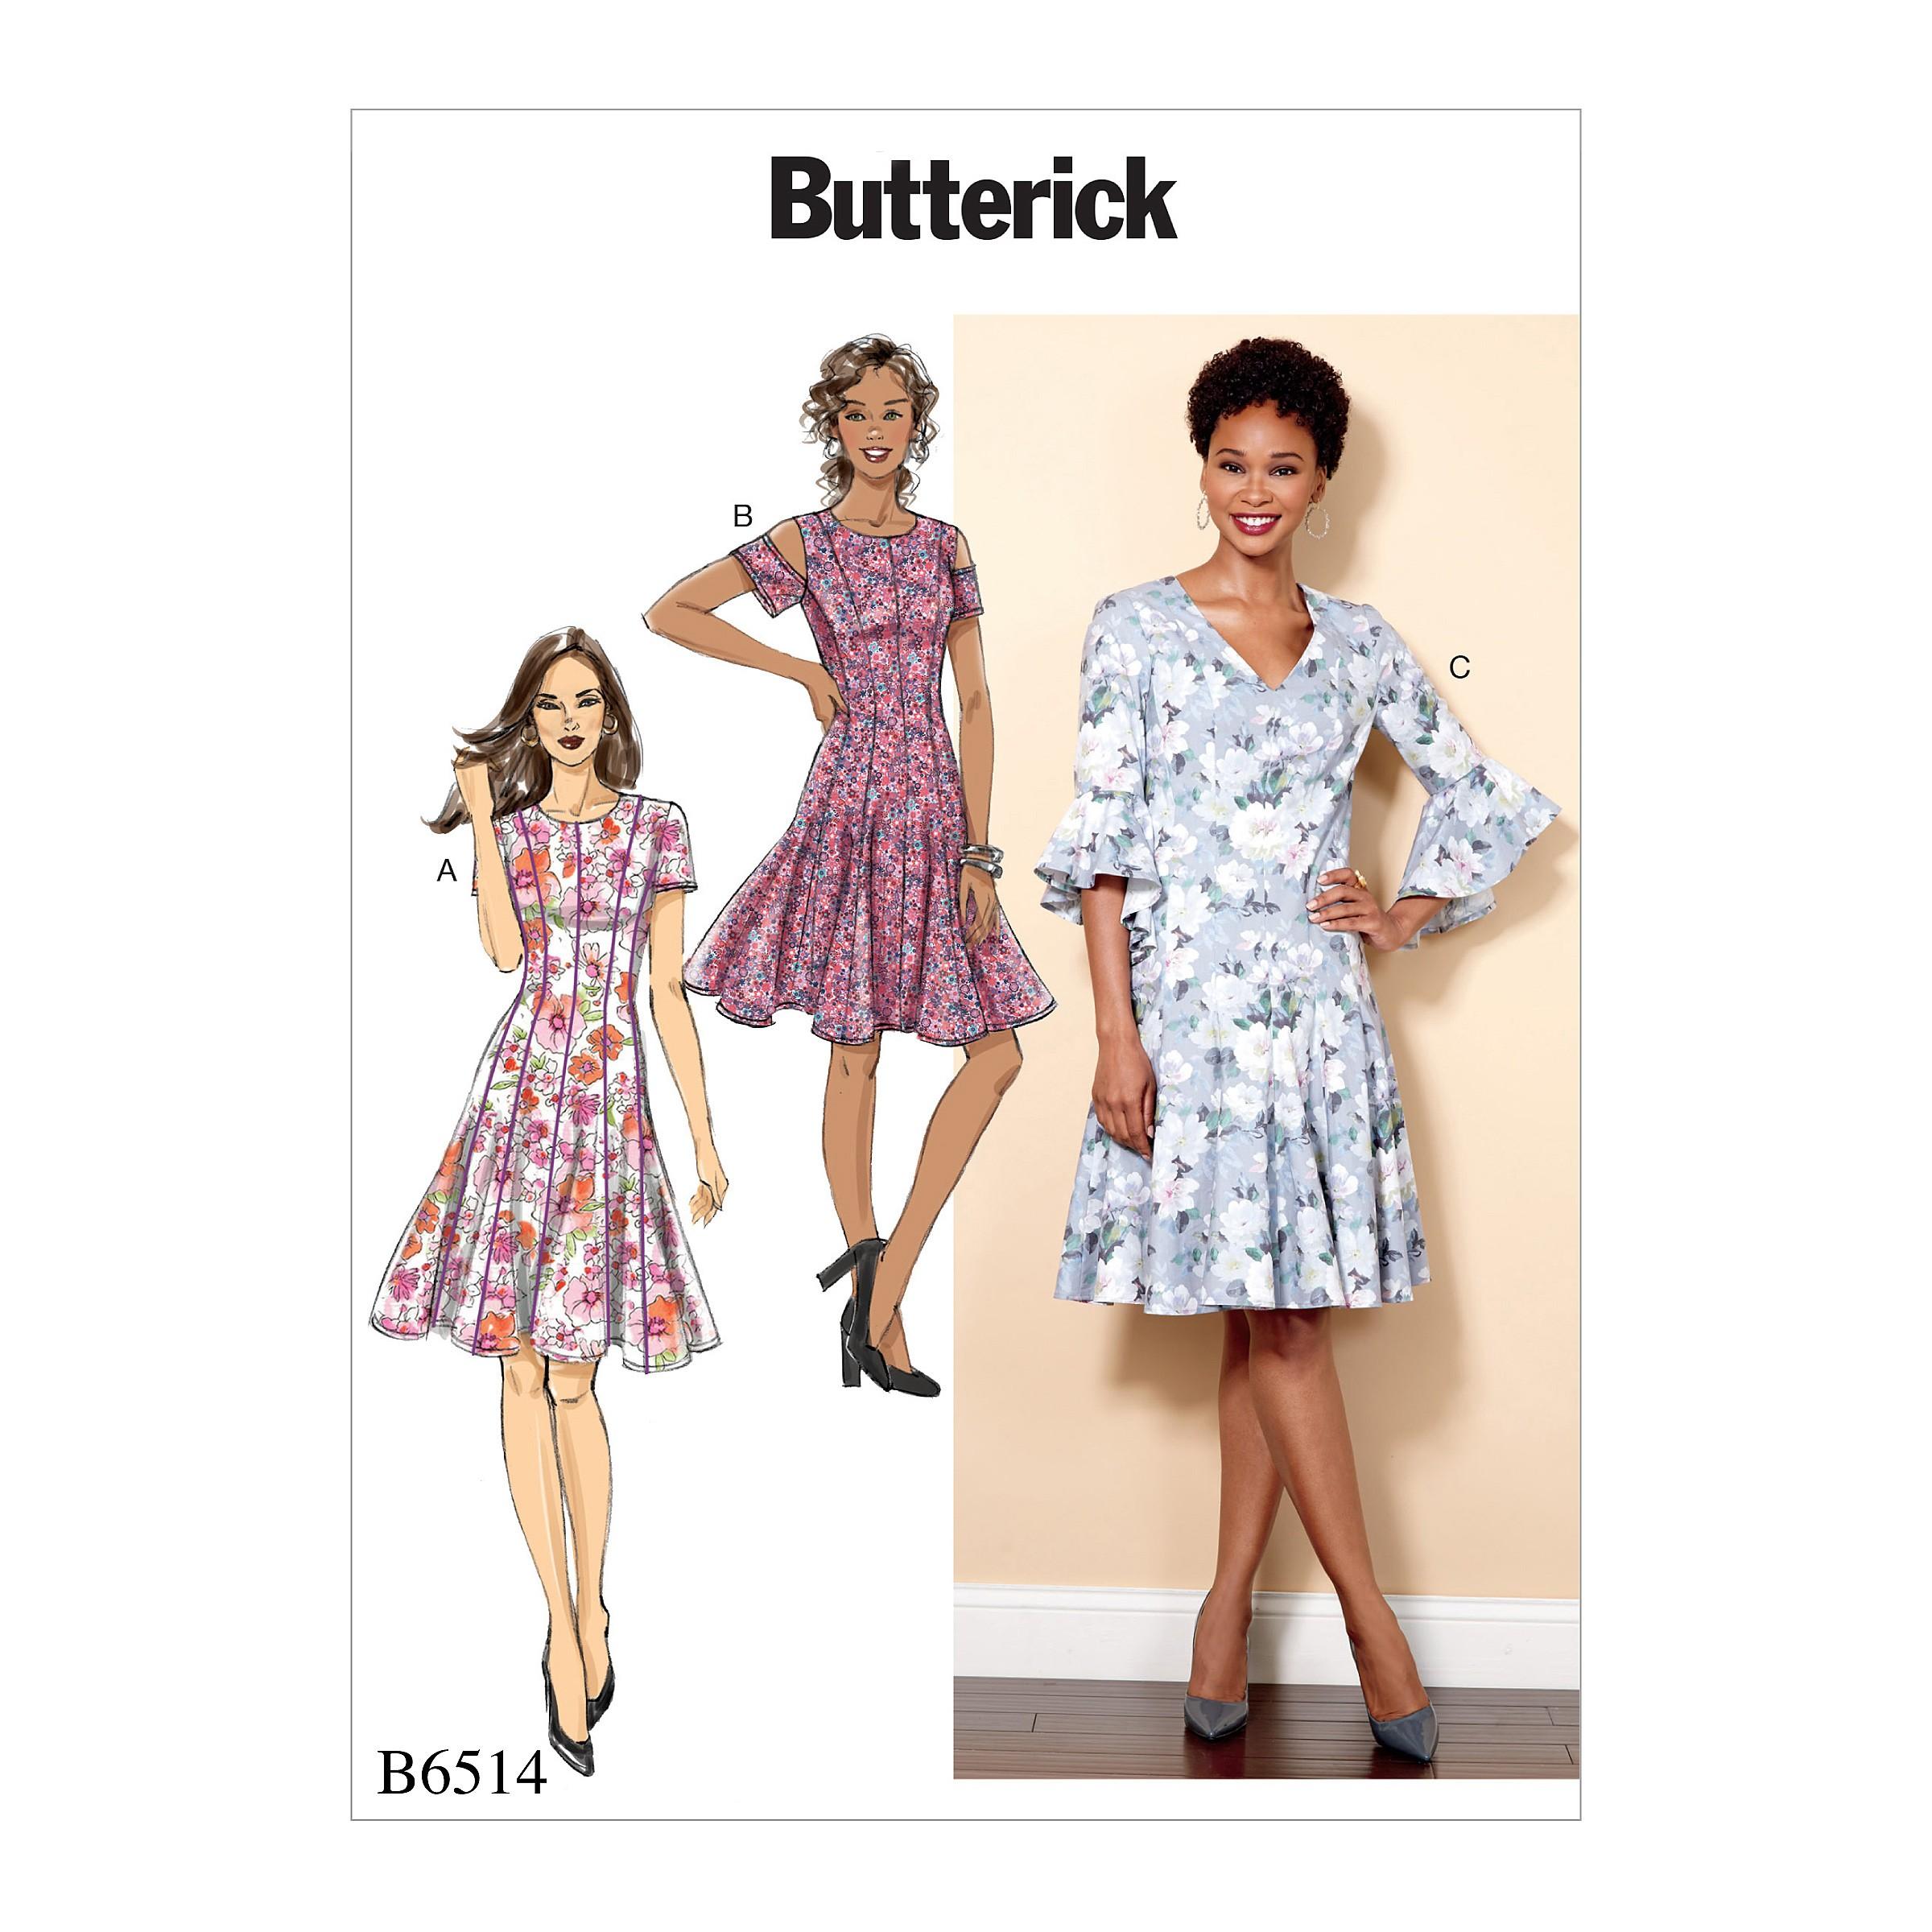 Butterick Sewing Pattern 6514 Misses' Miss Petite Paneled Dress